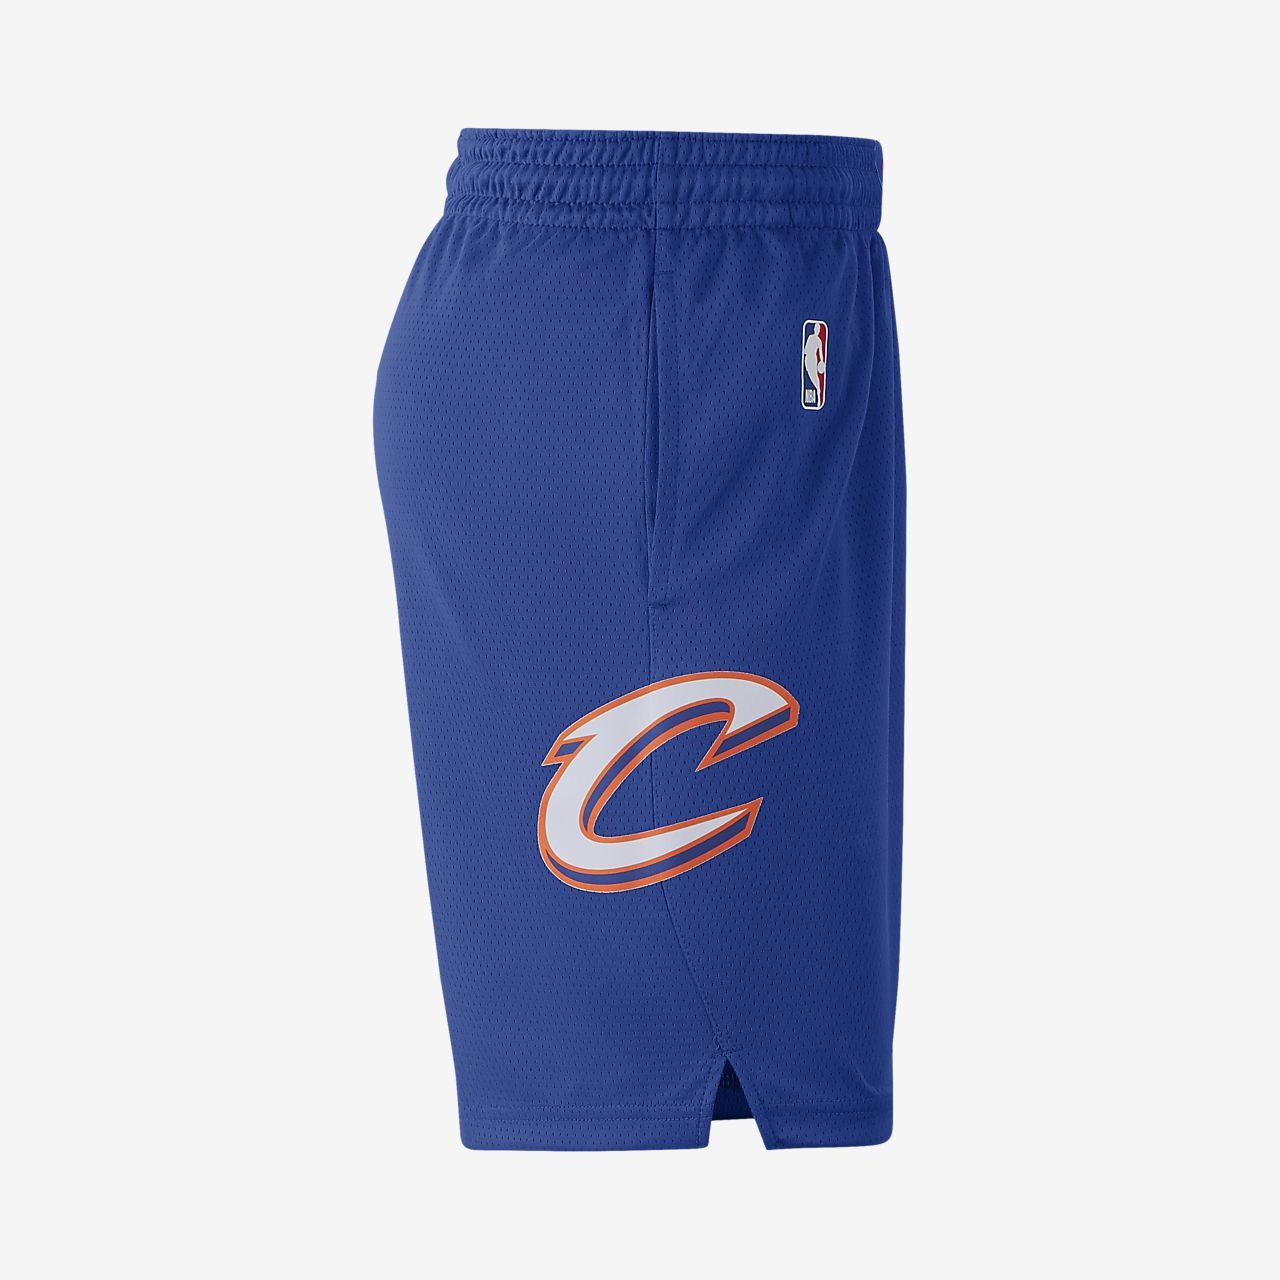 70f79bfb1 Cleveland Cavaliers City Edition Swingman Men s Nike NBA Shorts ...